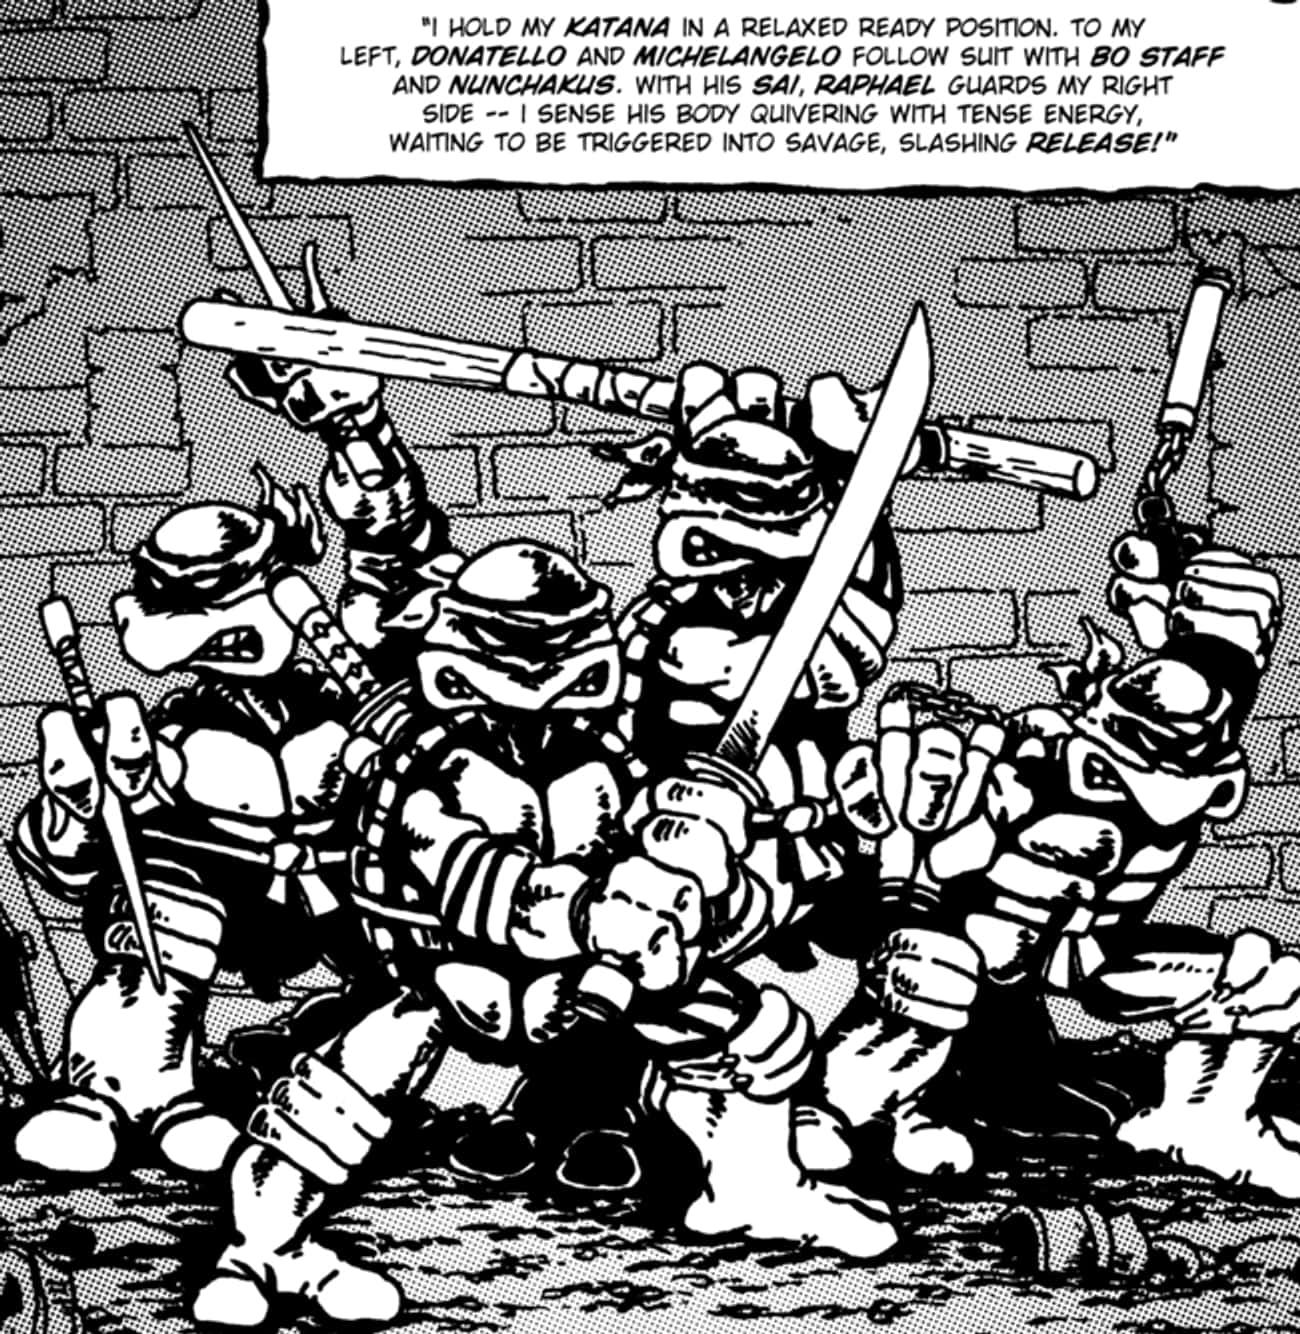 Master Splinter Raises The Tur is listed (or ranked) 1 on the list Before The Cartoons, The Teenage Mutant Ninja Turtles Used To Just Straight-Up Murder People